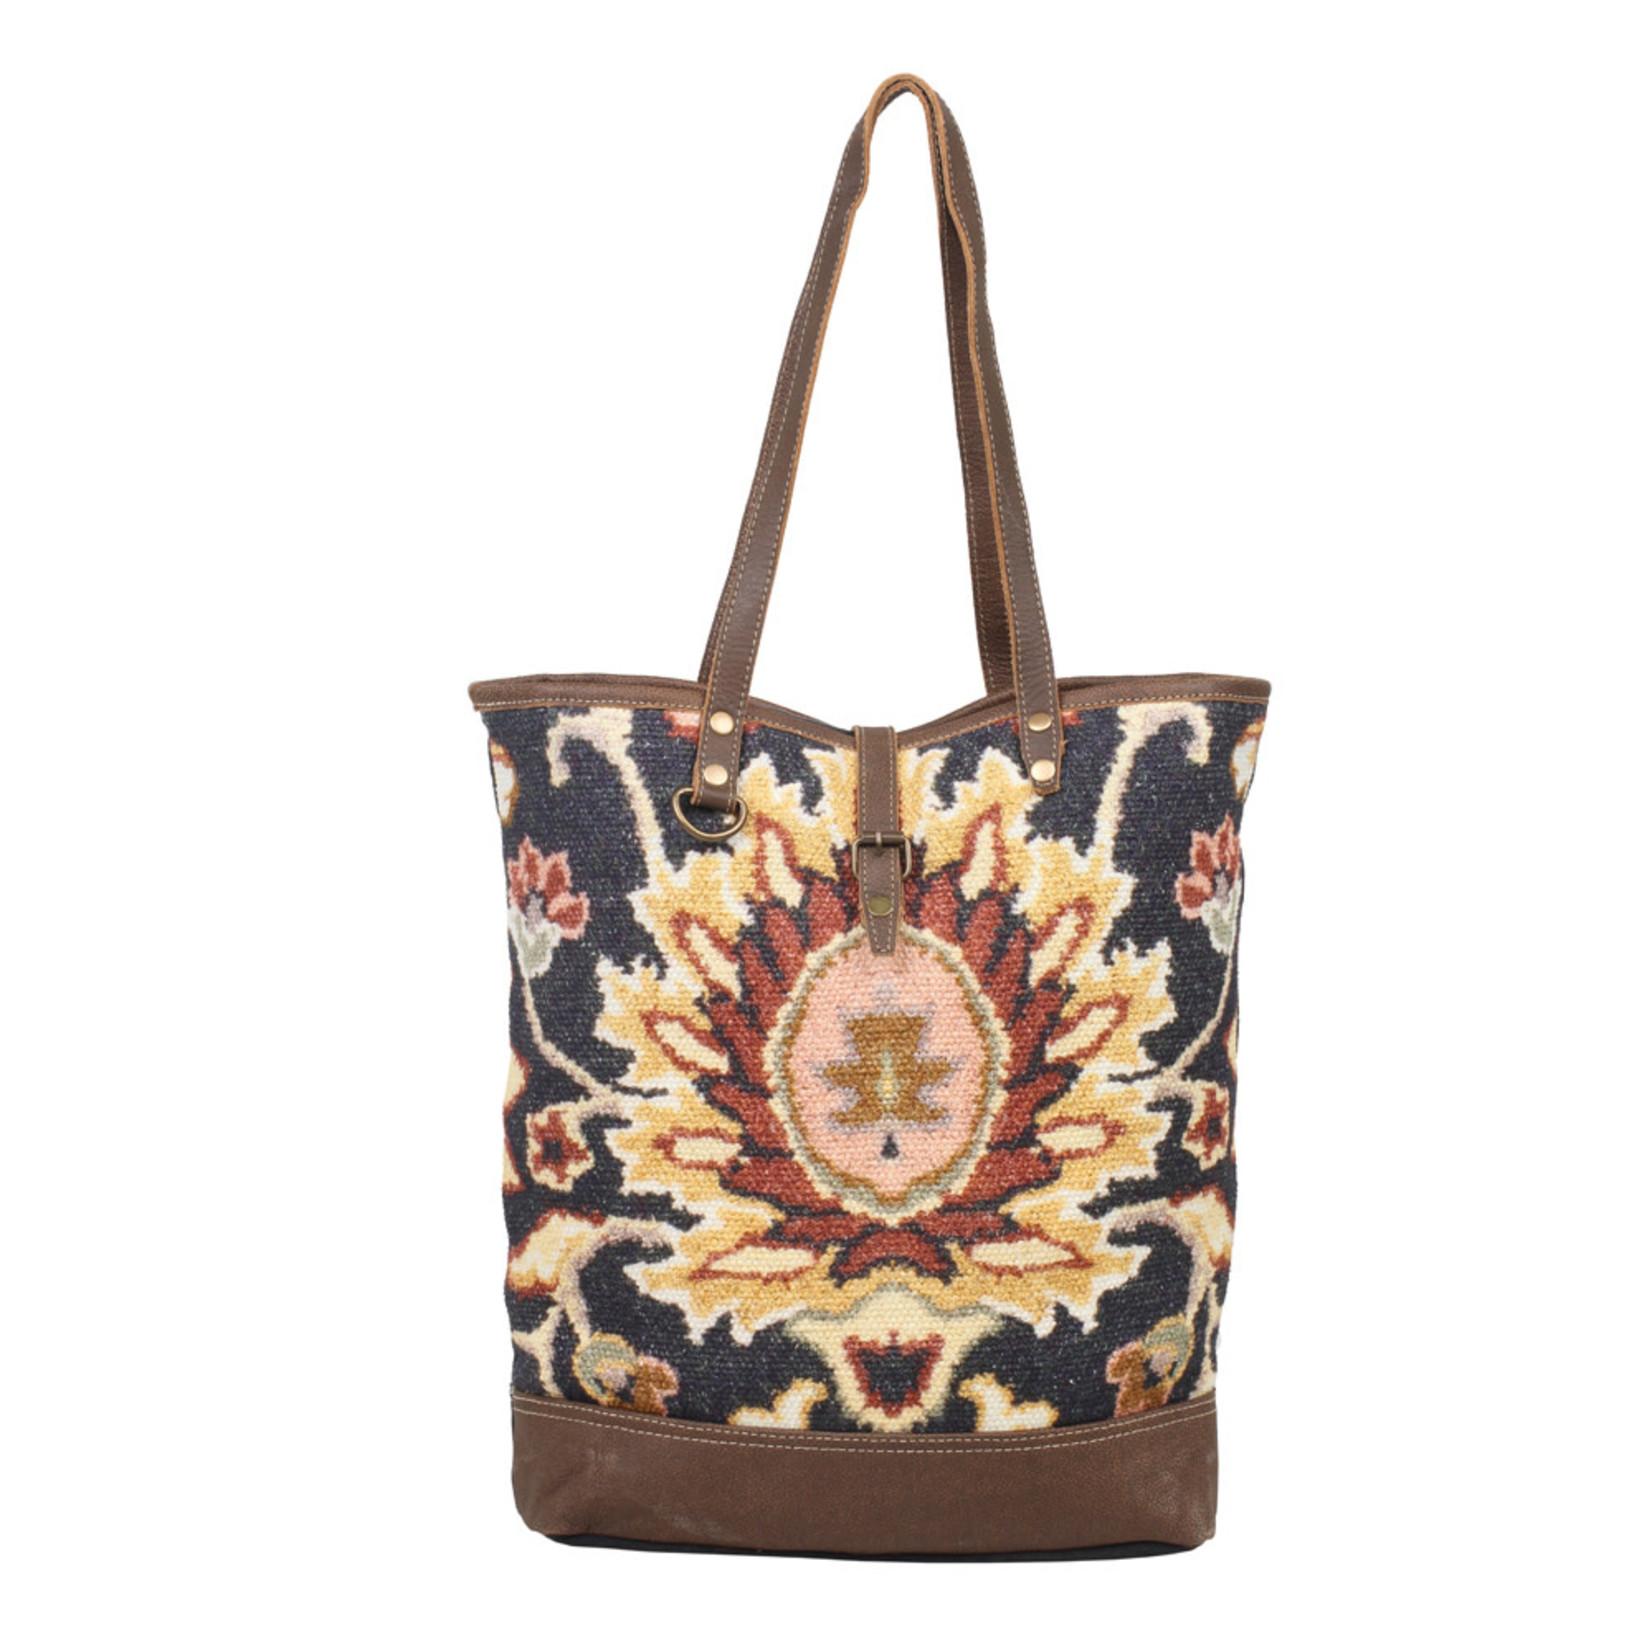 Myra Bags S-2650 Benevolence Tote Bag